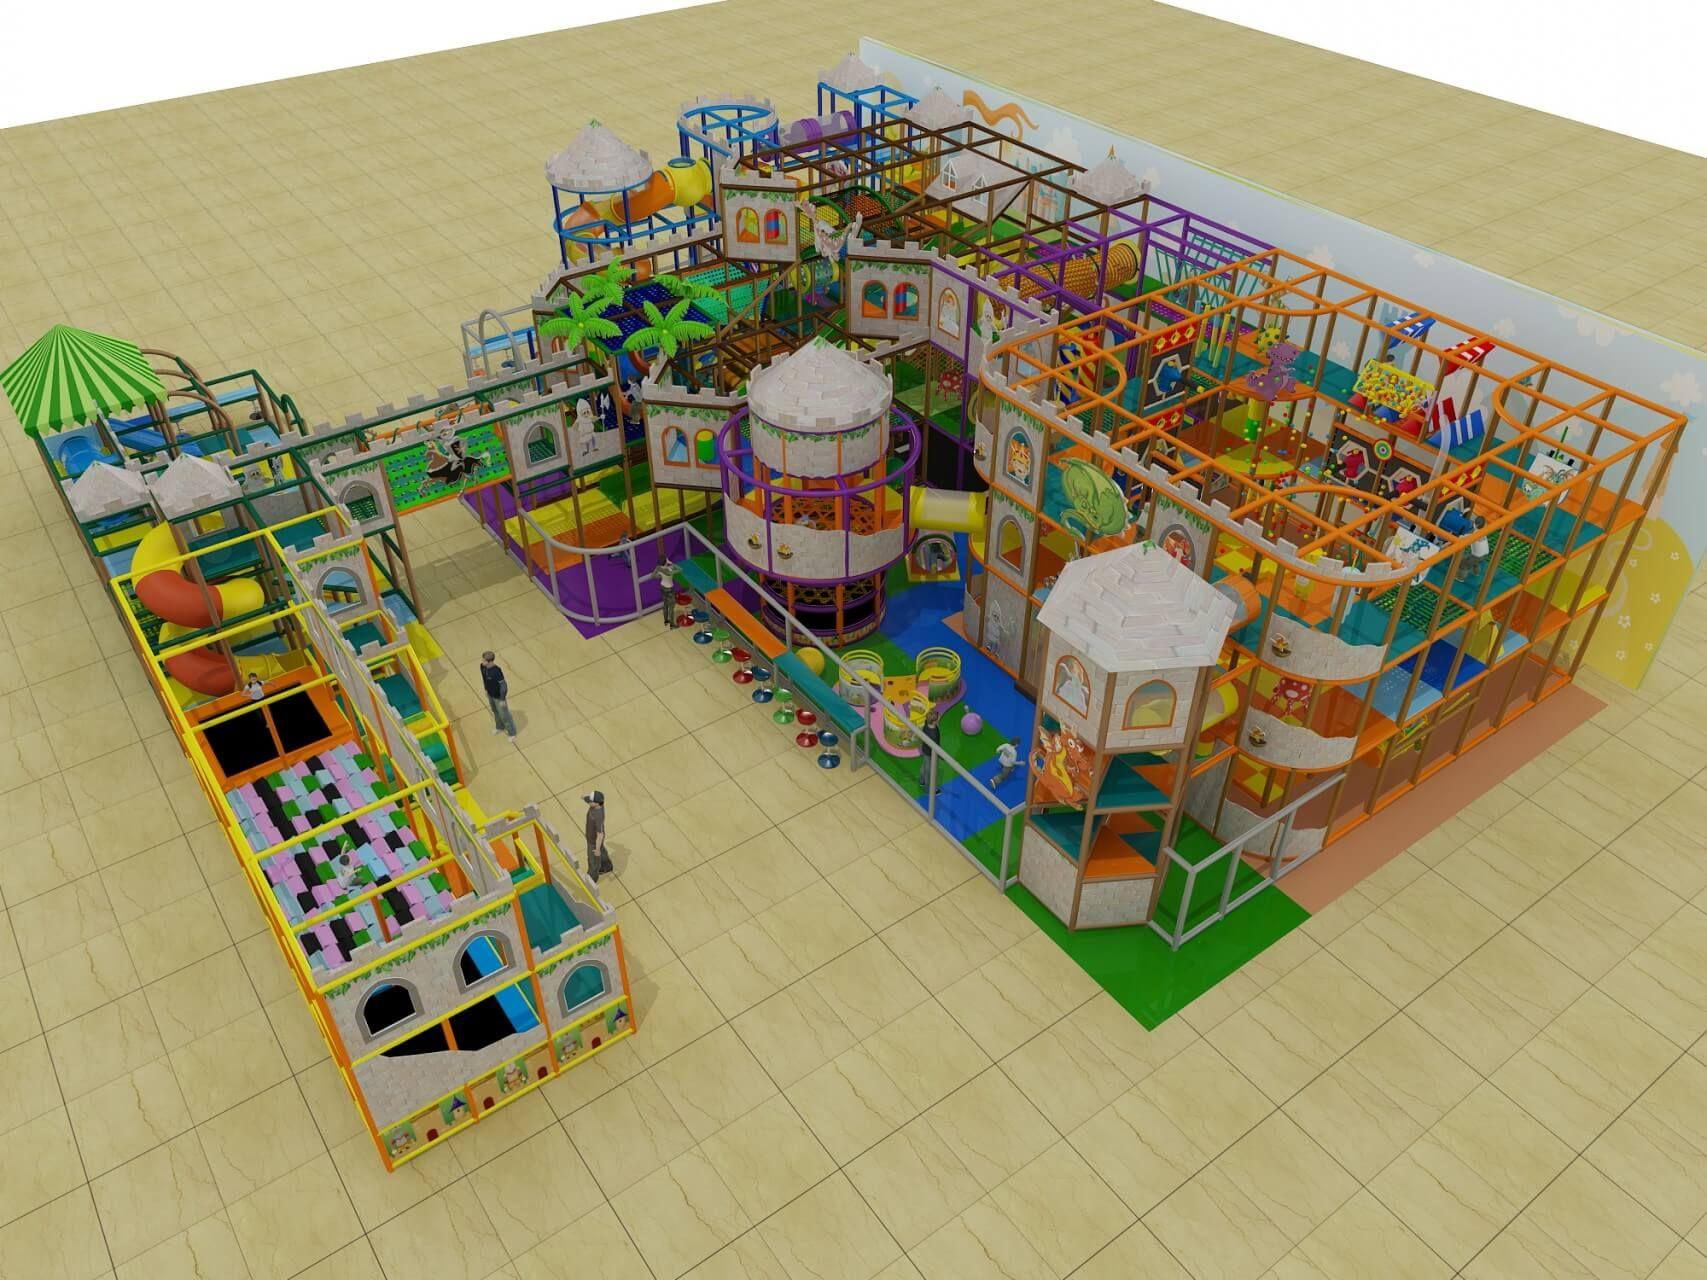 Large castled themed indoor playground   Playground   Pinterest ...